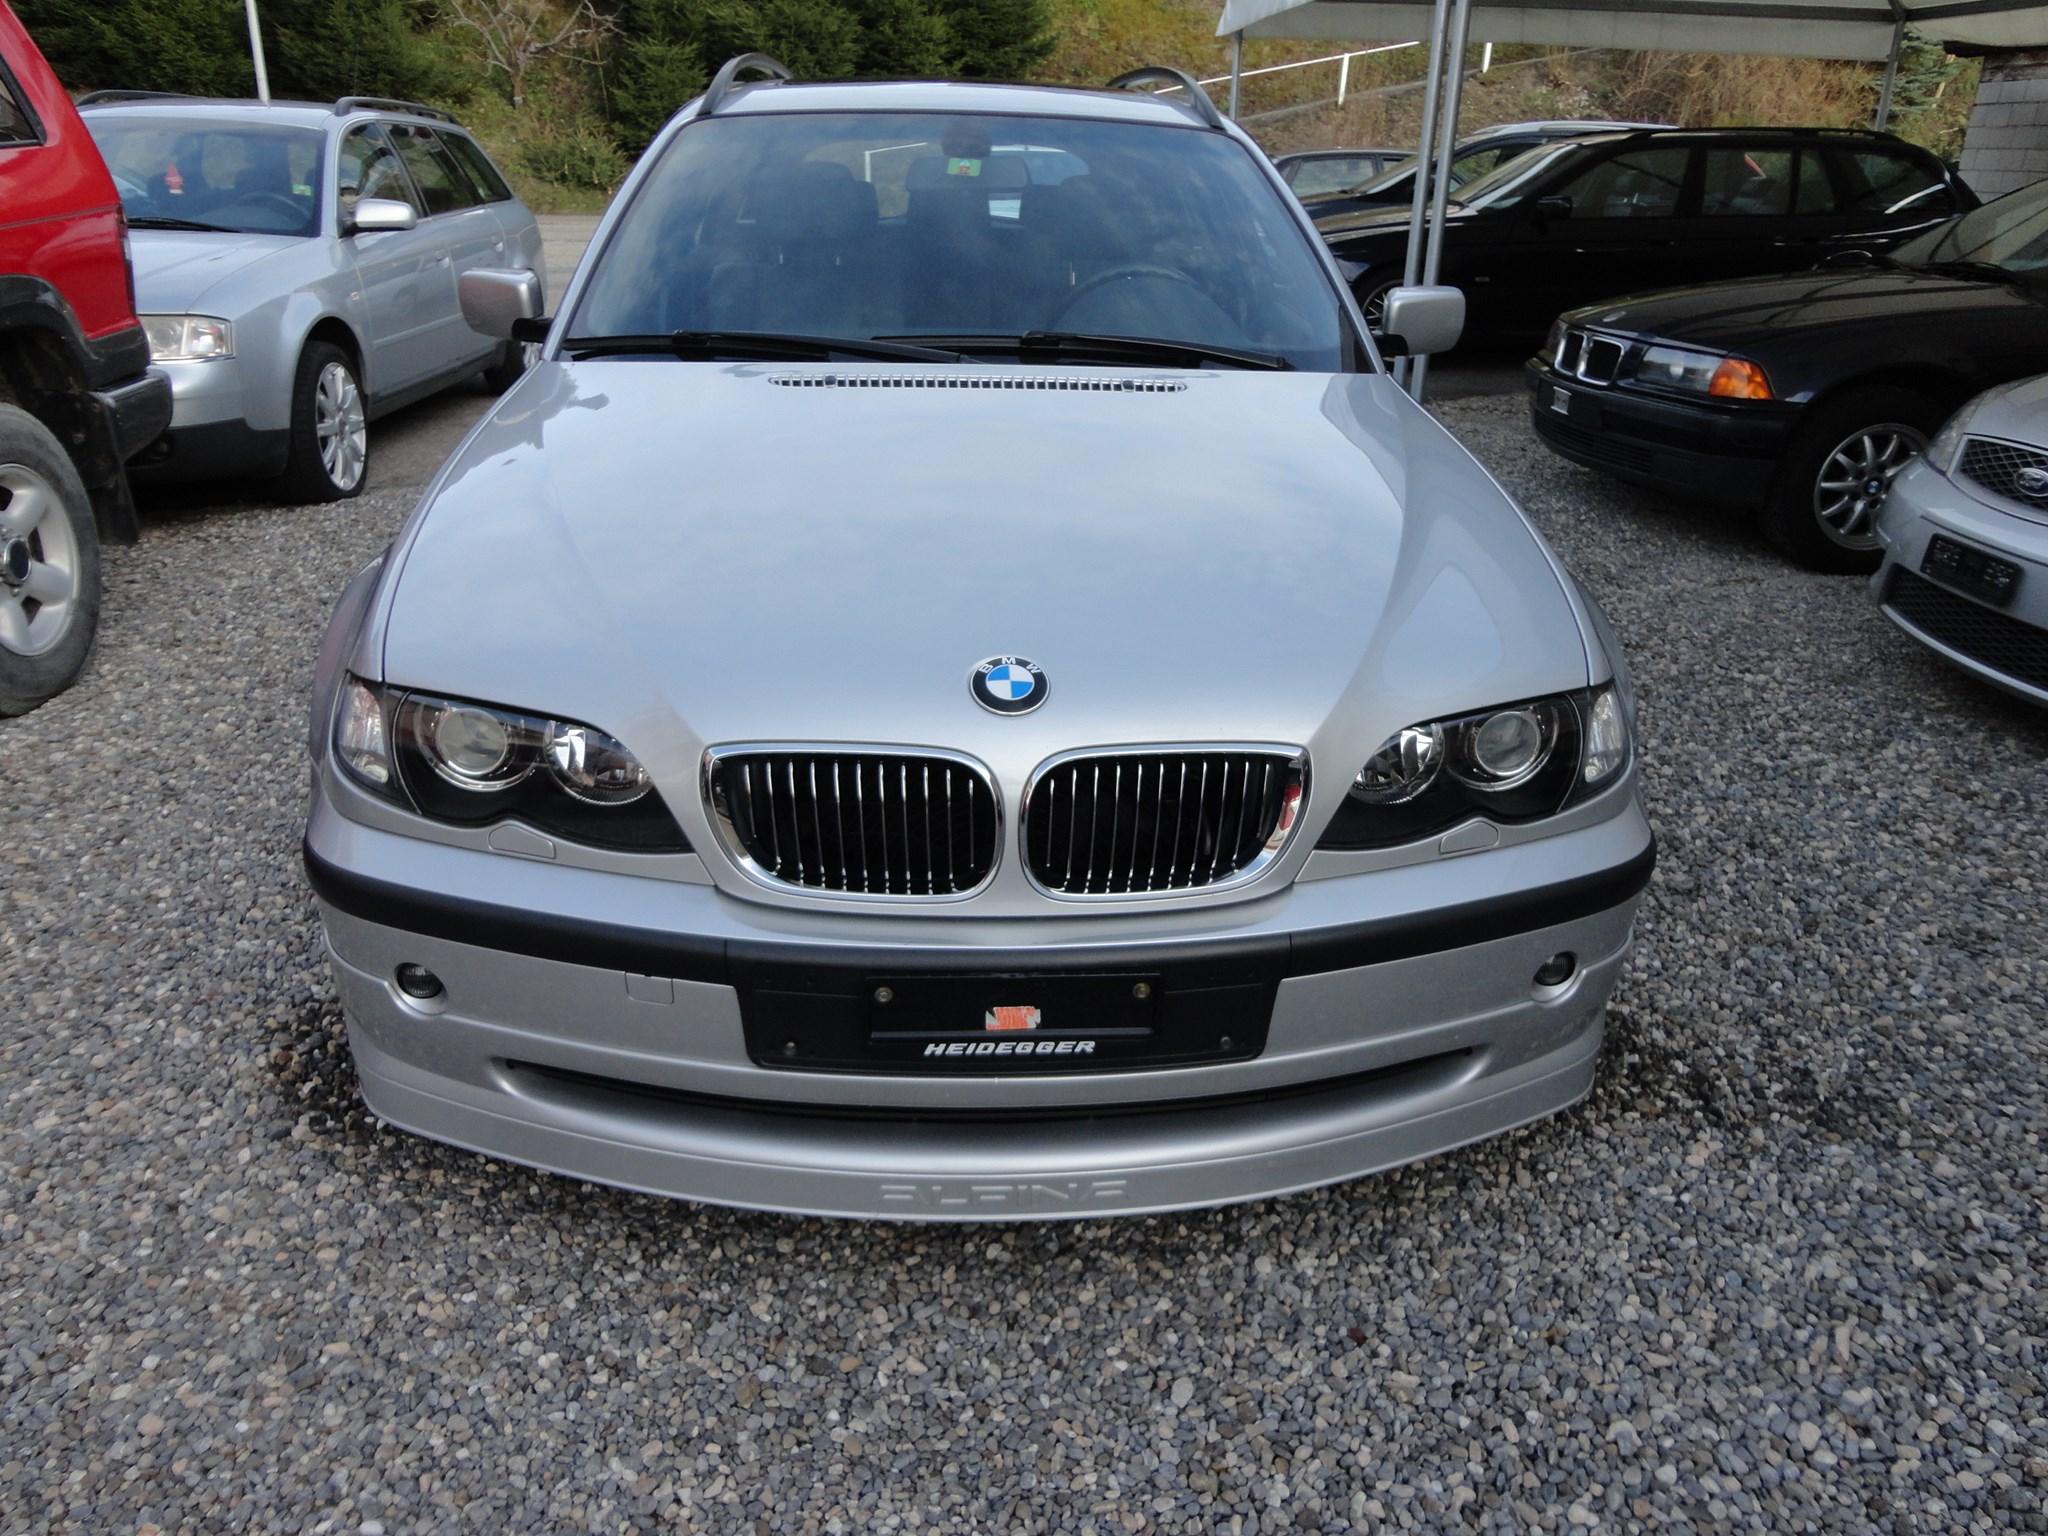 estate BMW Alpina B3/D3 3 SERIES B3 3.3 X Touring S.Tronic